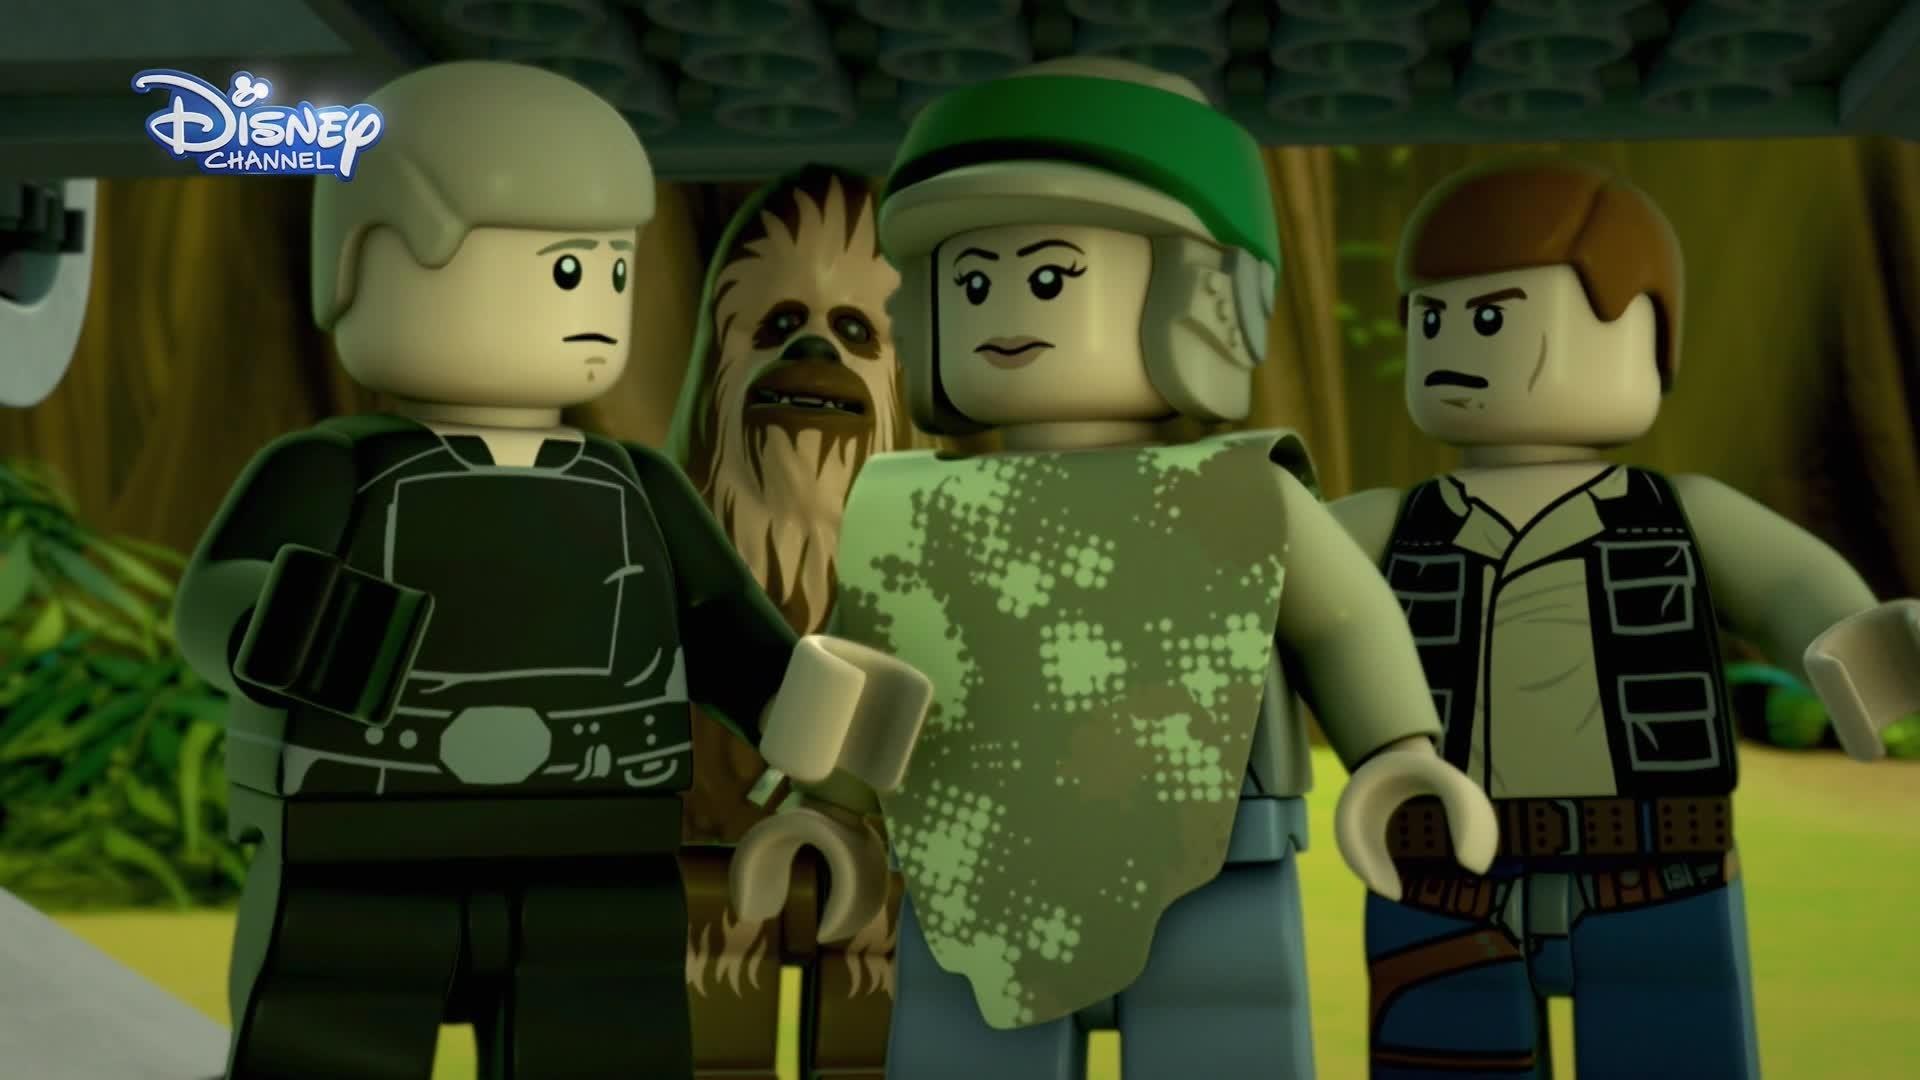 Star Wars: Contos de droides - Manobra em Geonosis